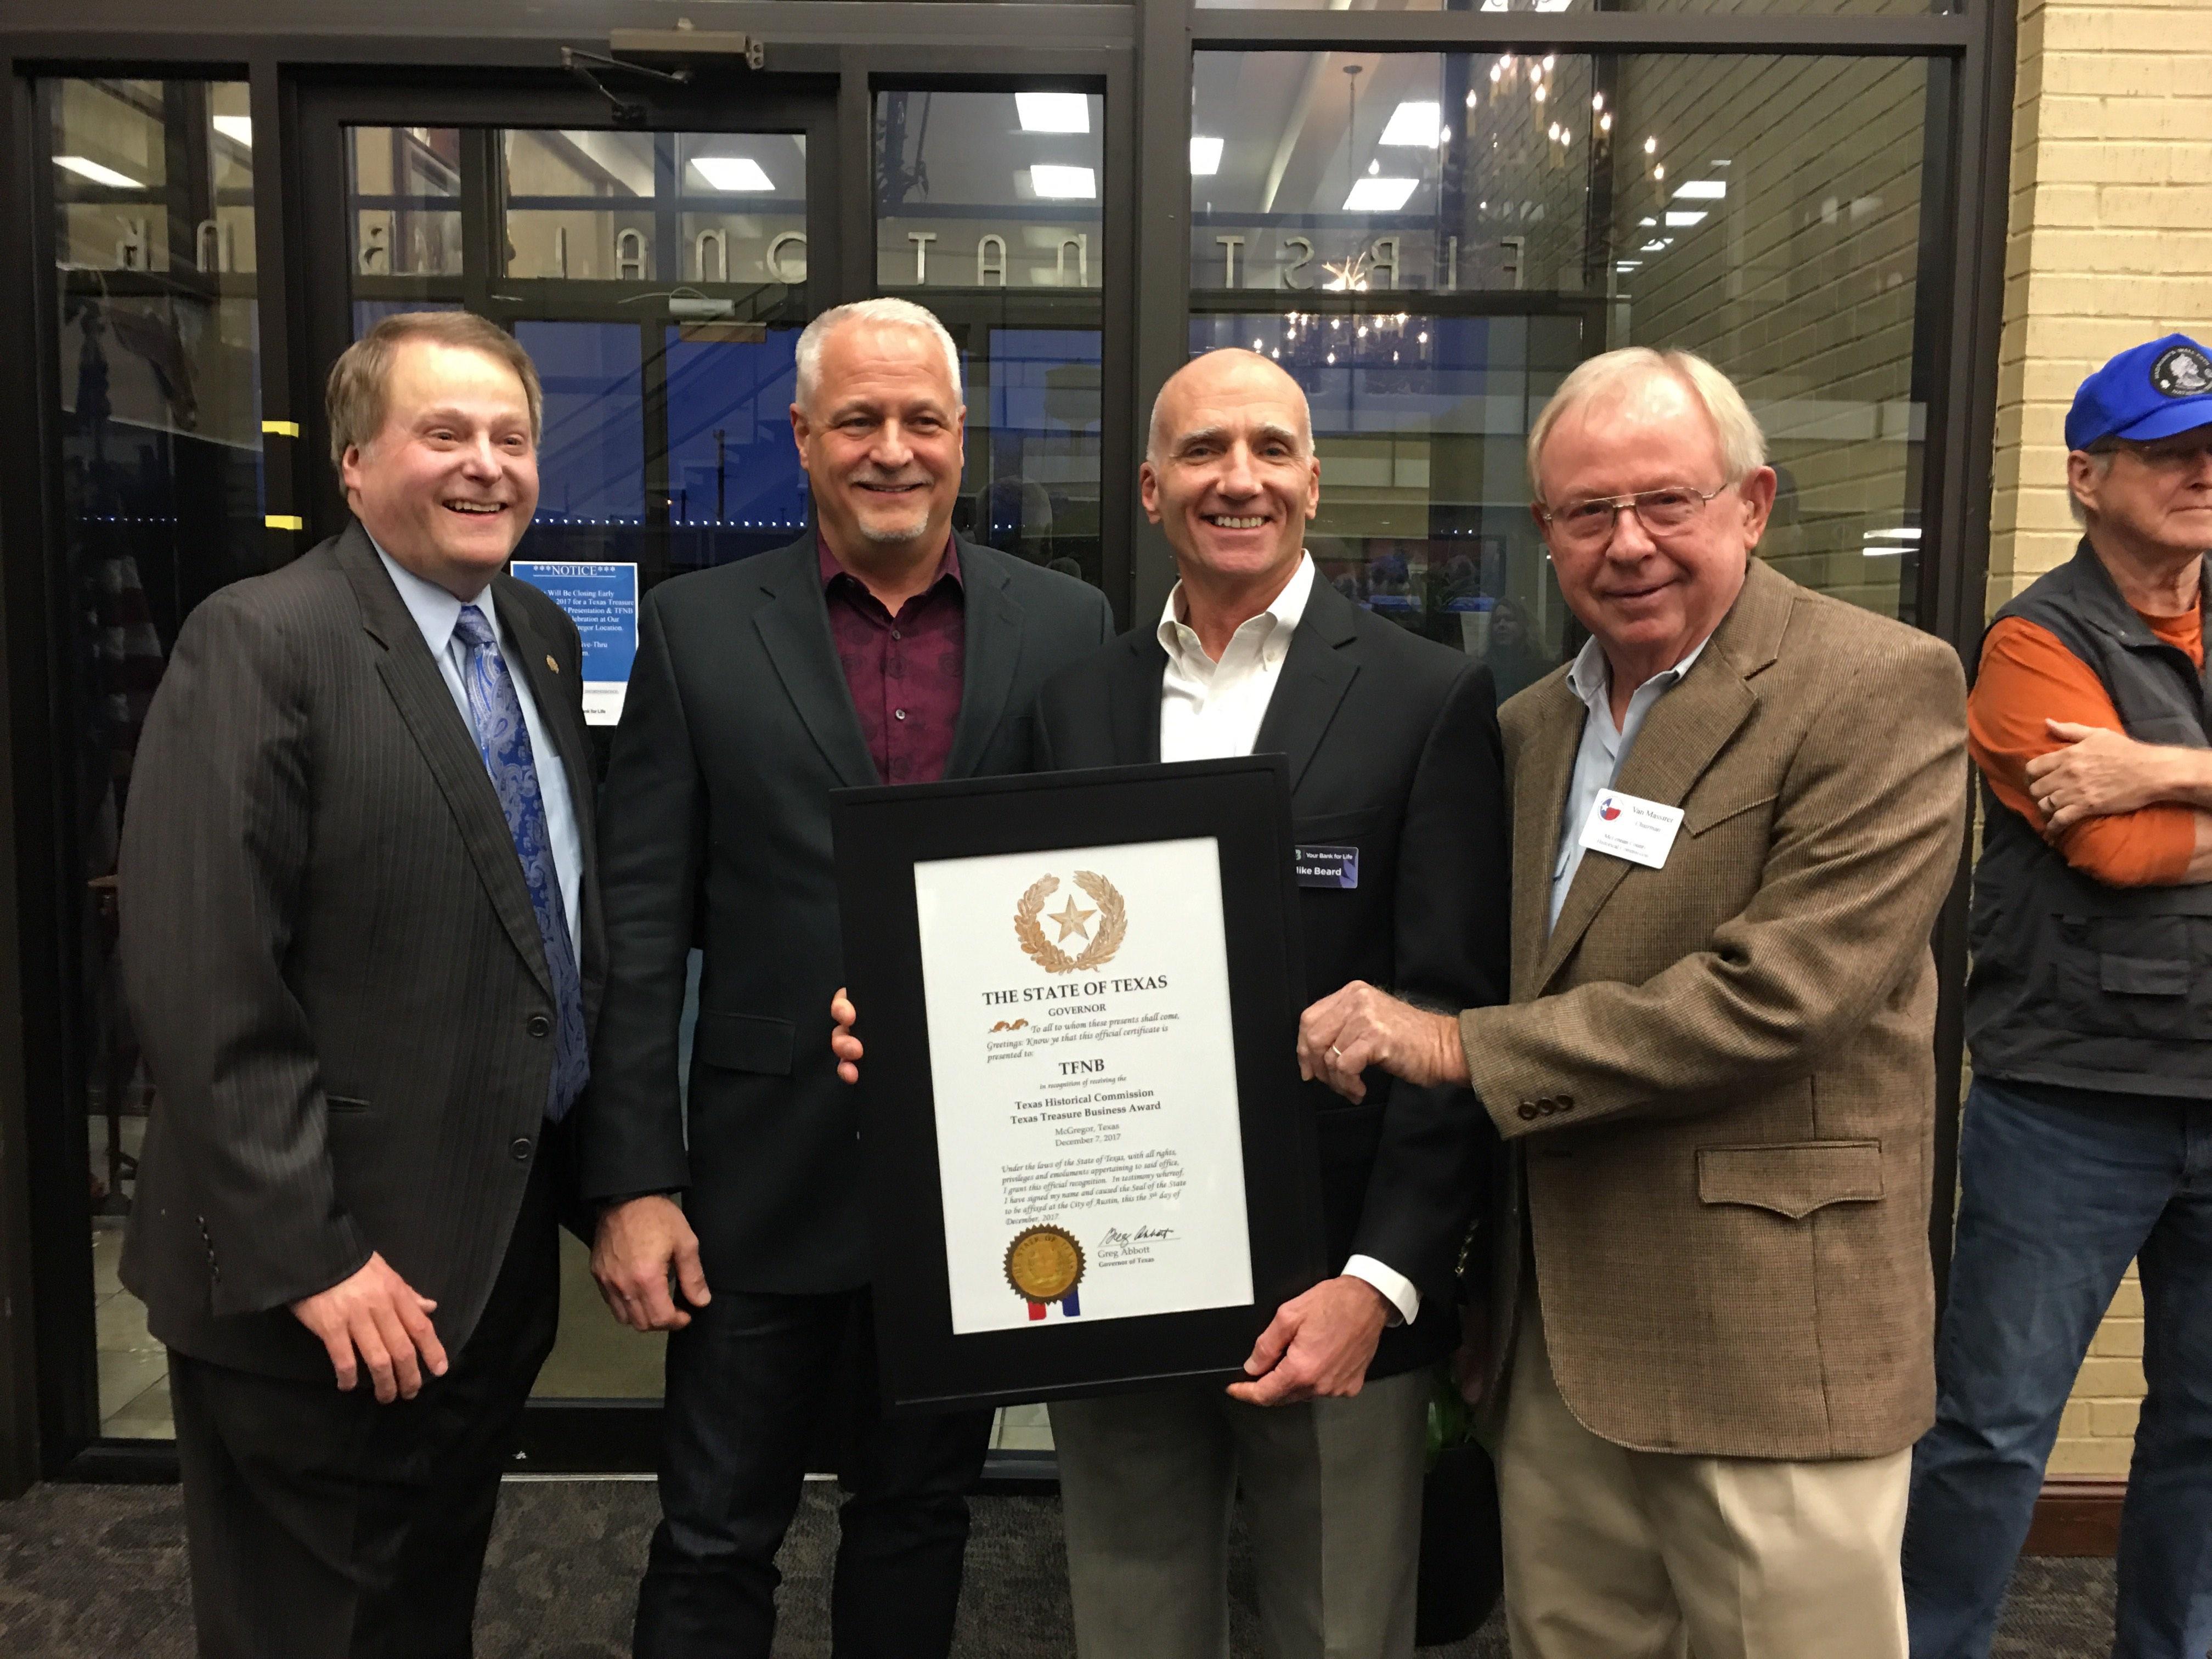 Texas Treasure Business Award TFNB McGregor Bank